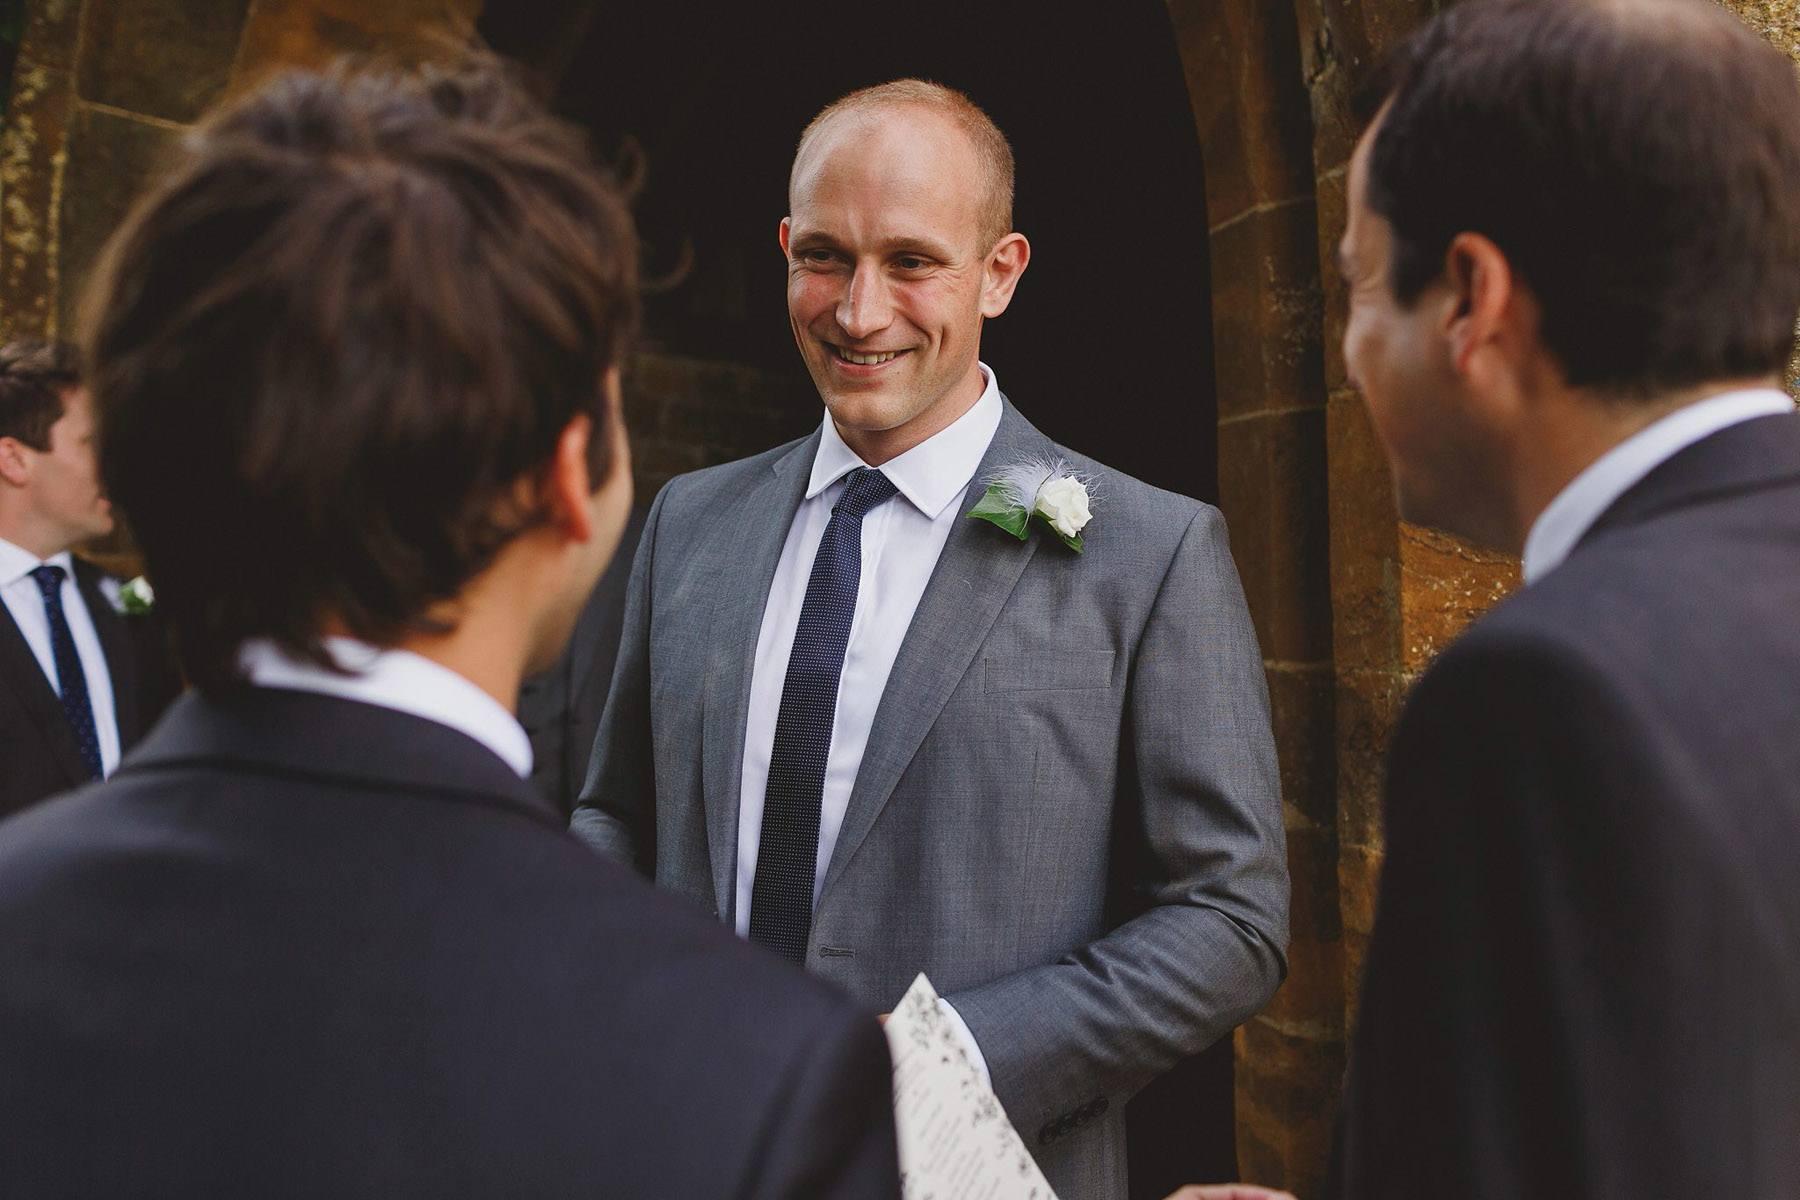 oxfordshire-wedding-photographer-022